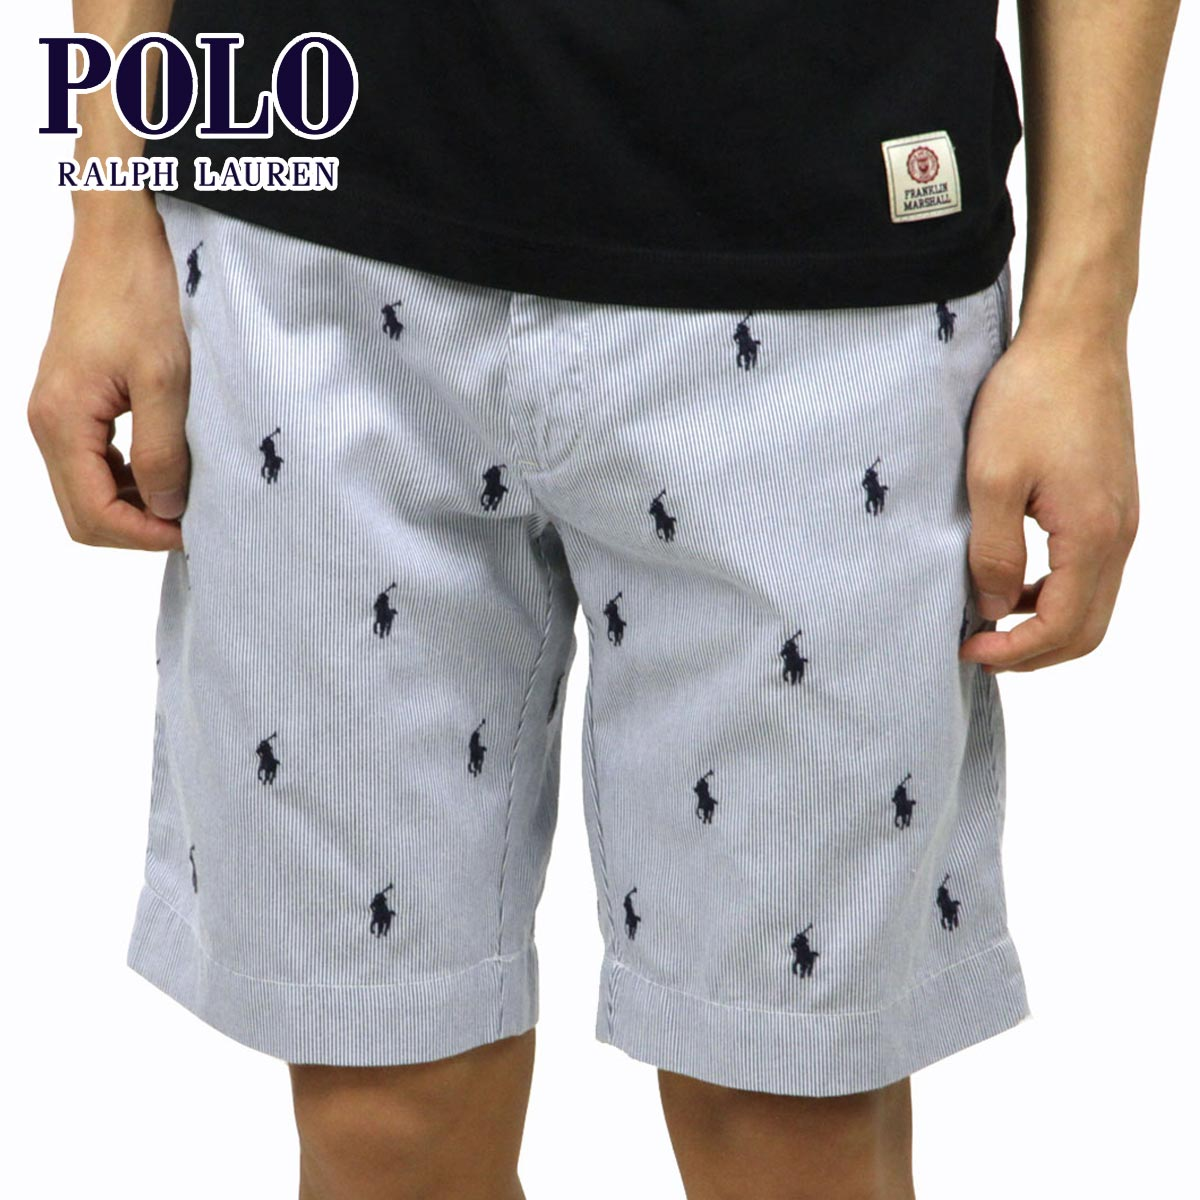 8a3d17e21 Polo Ralph Lauren POLO RALPH LAUREN genuine mens shorts PONY SHORTS BLUE  10P22Jul14